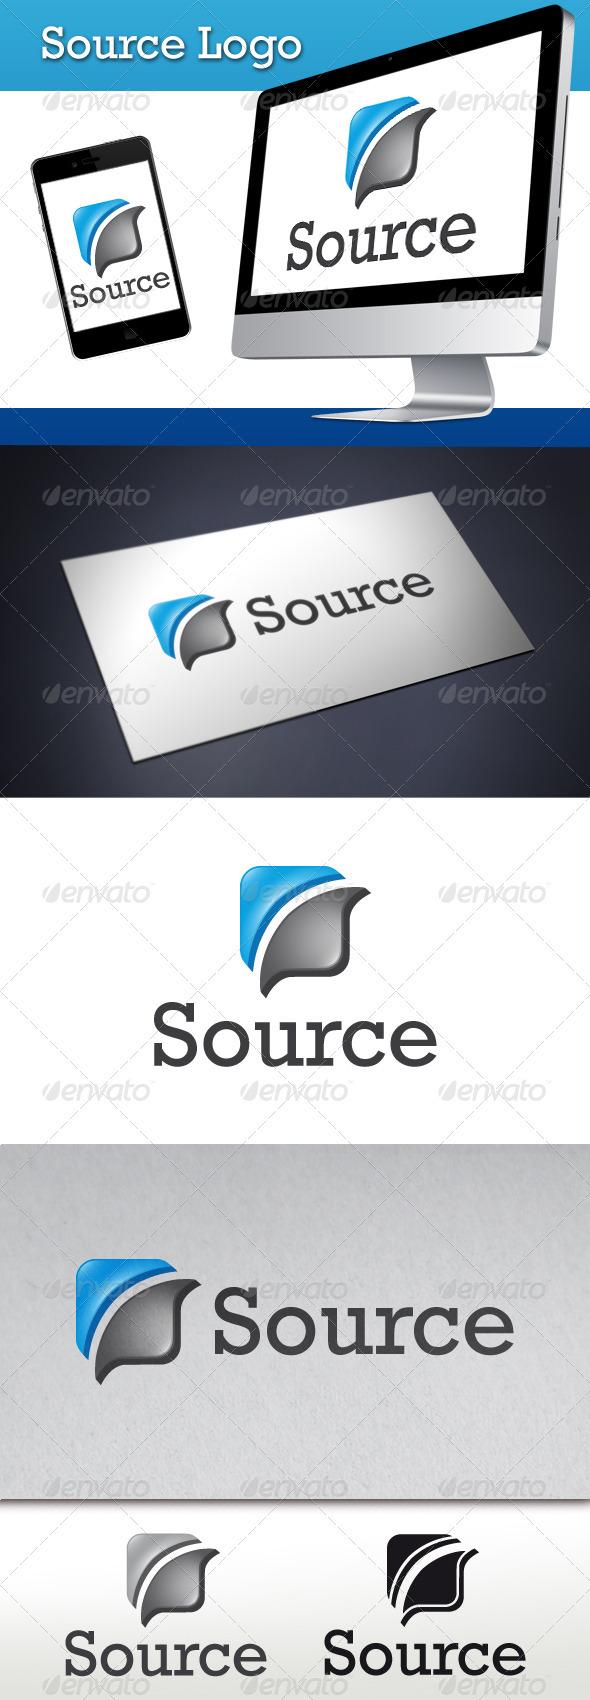 Source Logo Template